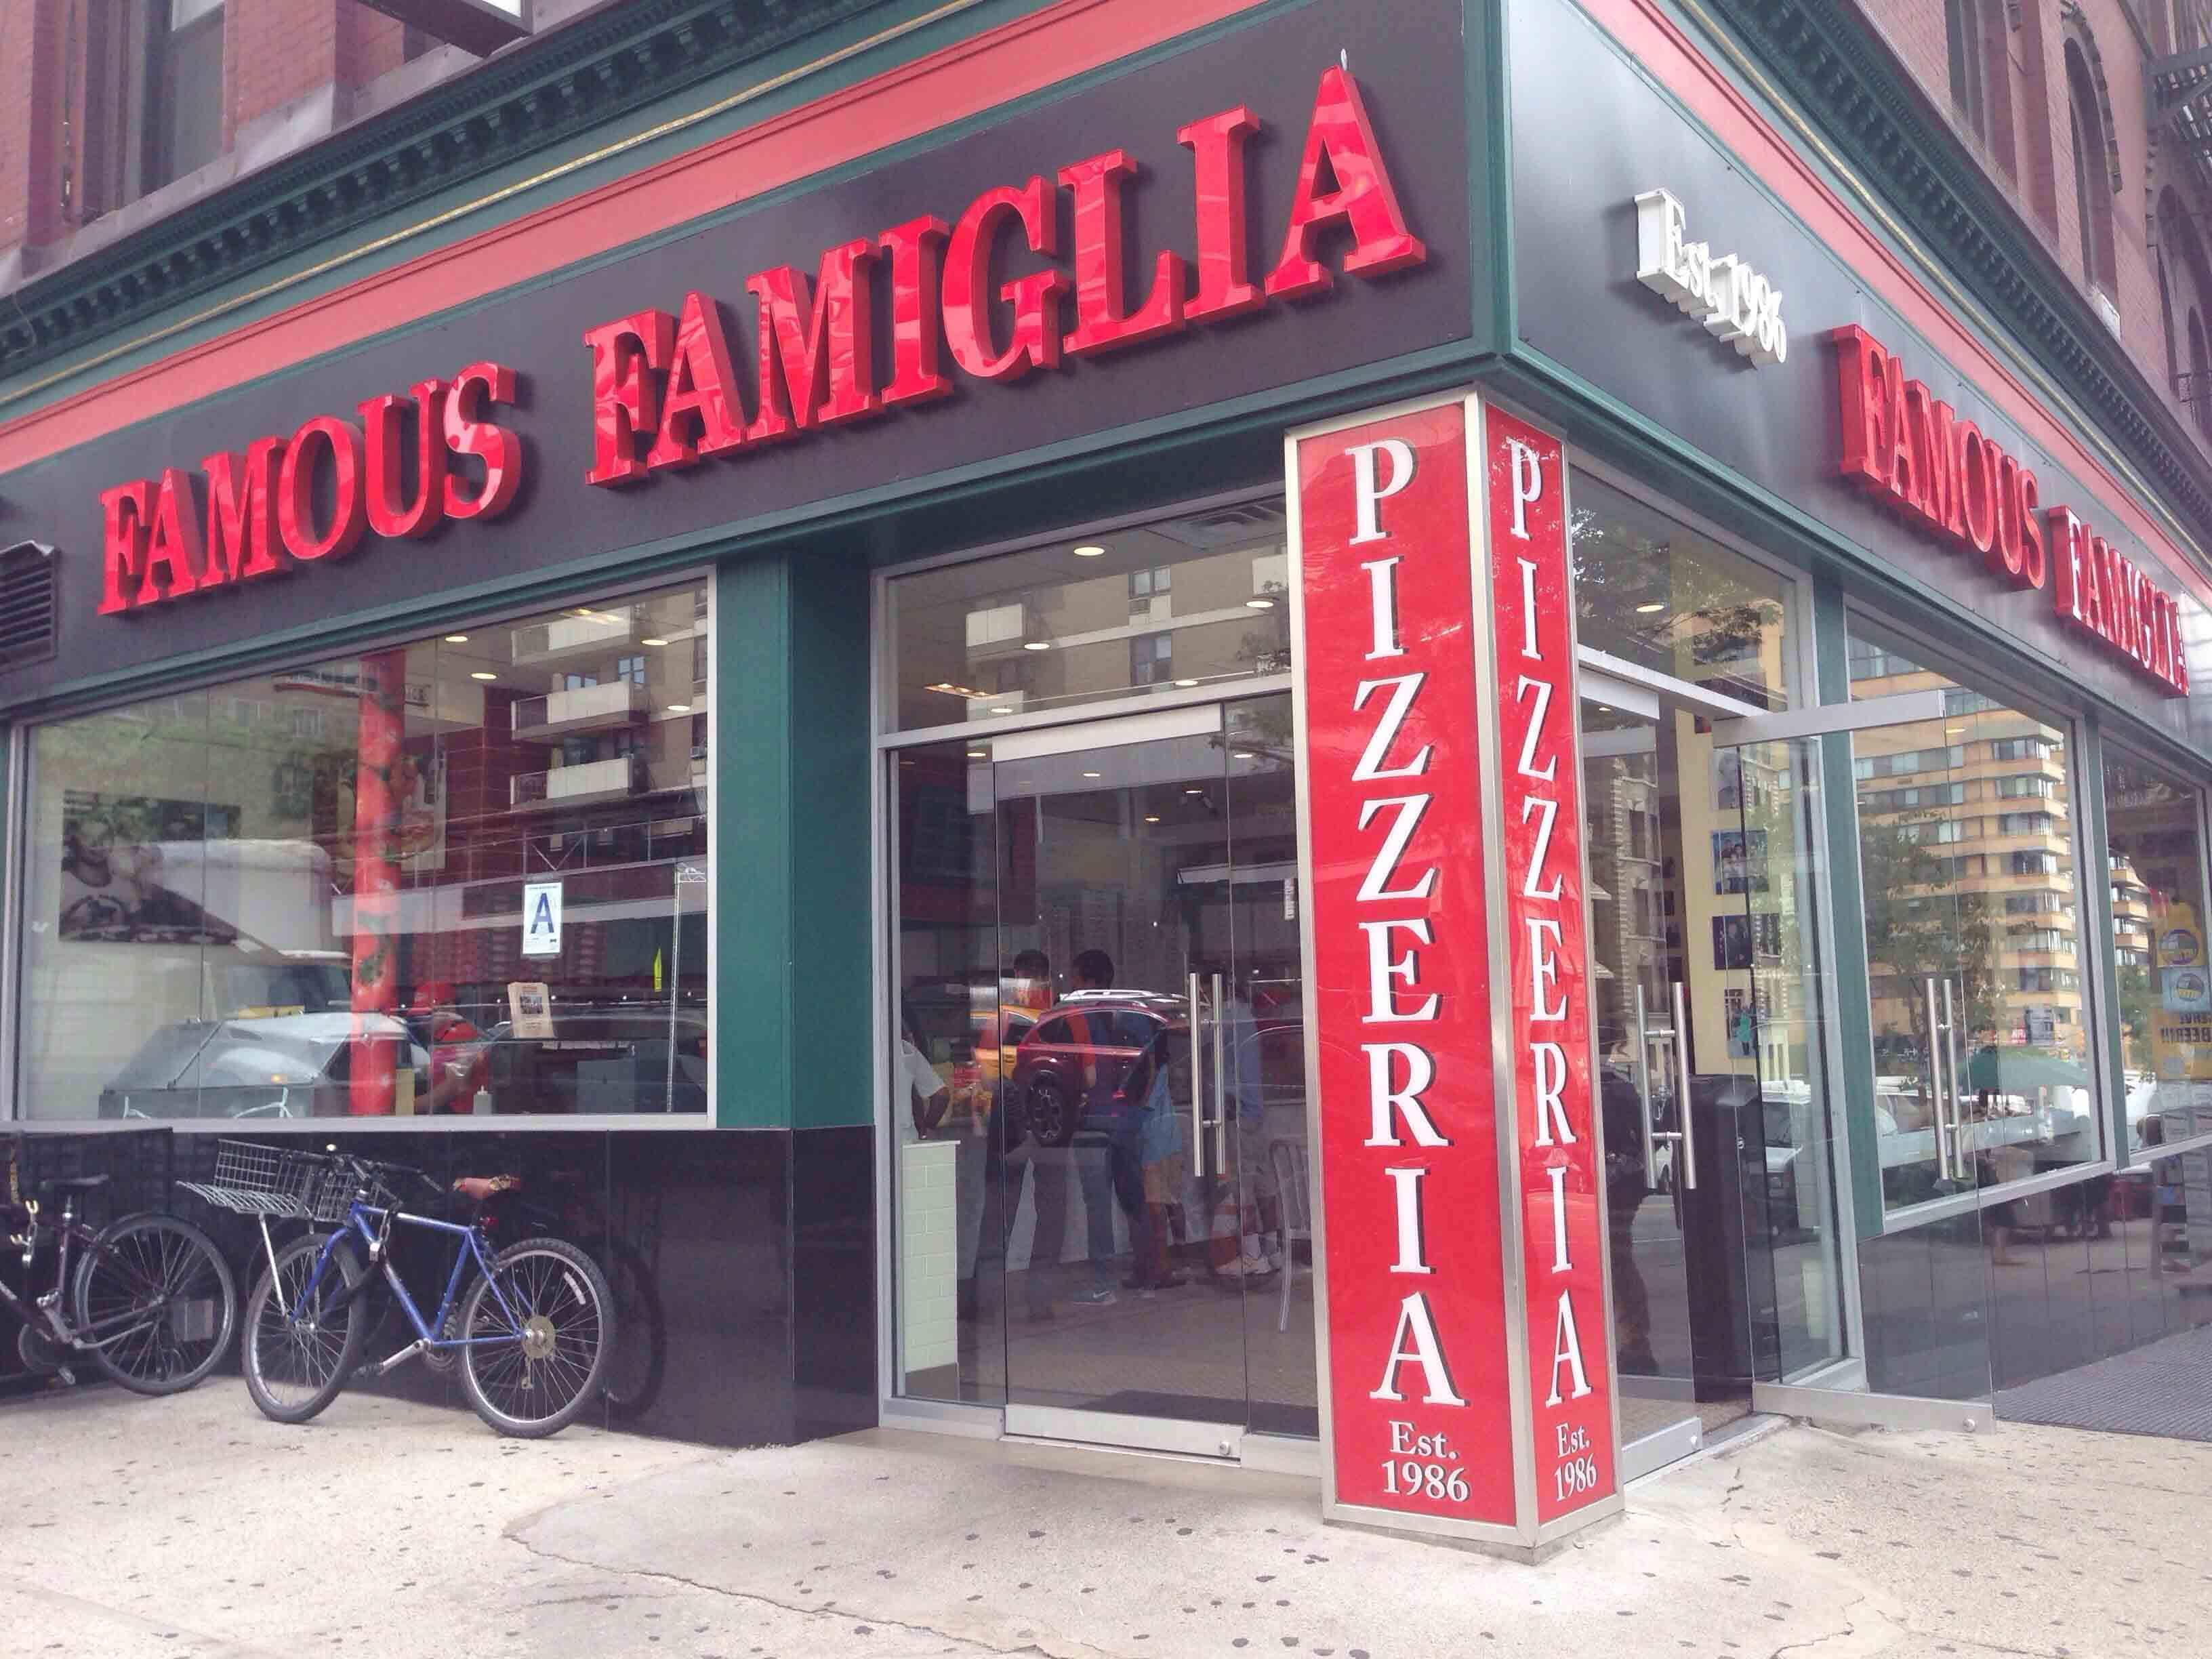 Famous Famiglia Pizzeria, New York, New York City